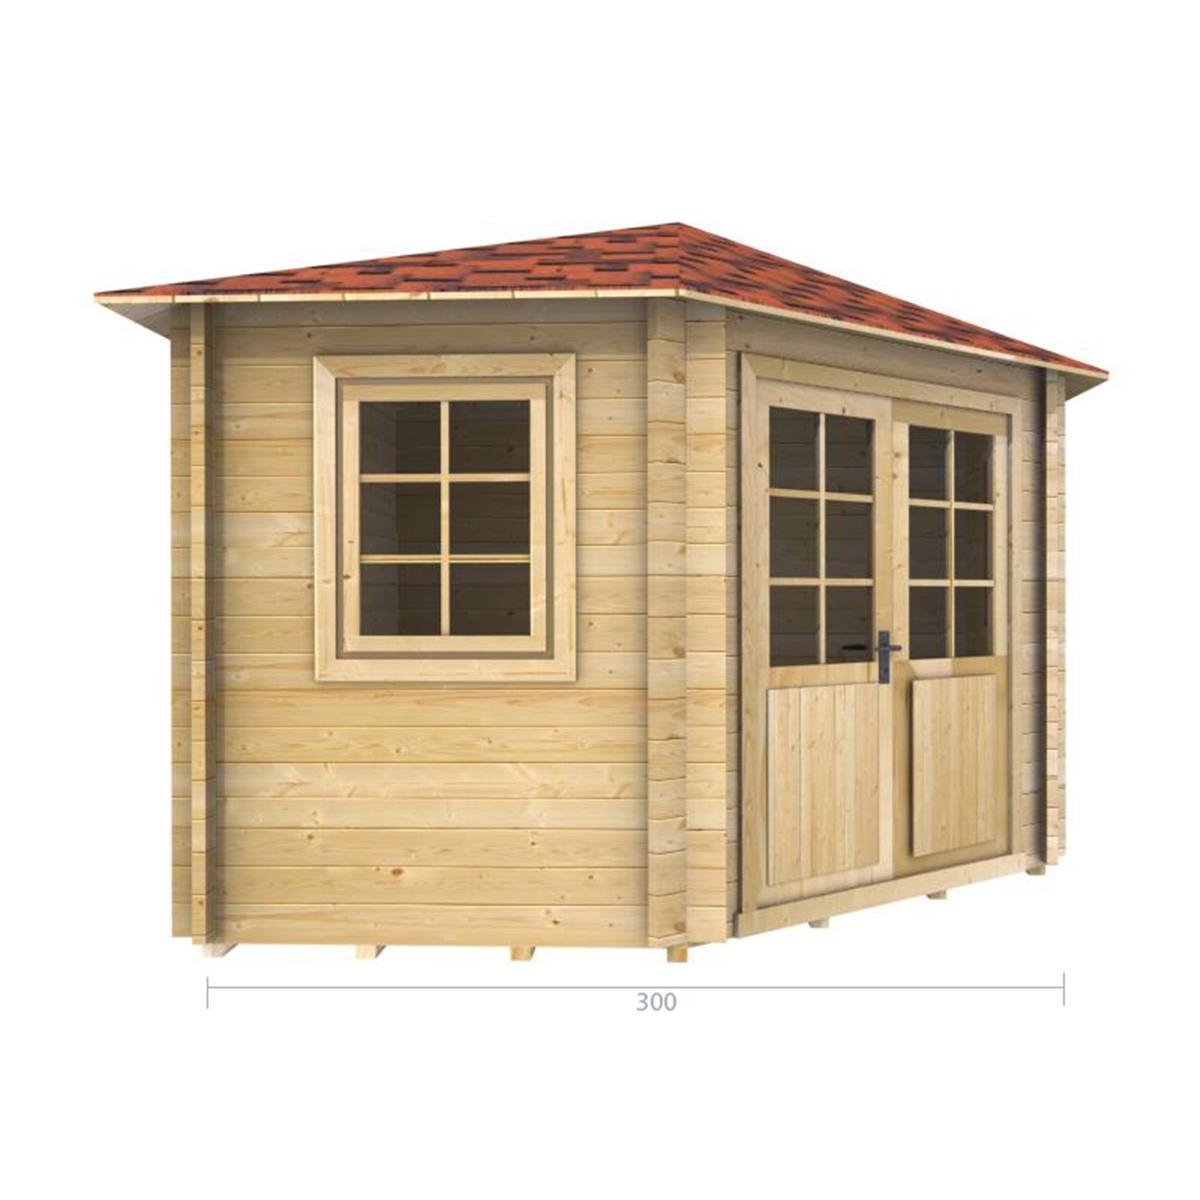 3m x 3m 10 x 10 corner log cabin 2036 double glazing. Black Bedroom Furniture Sets. Home Design Ideas